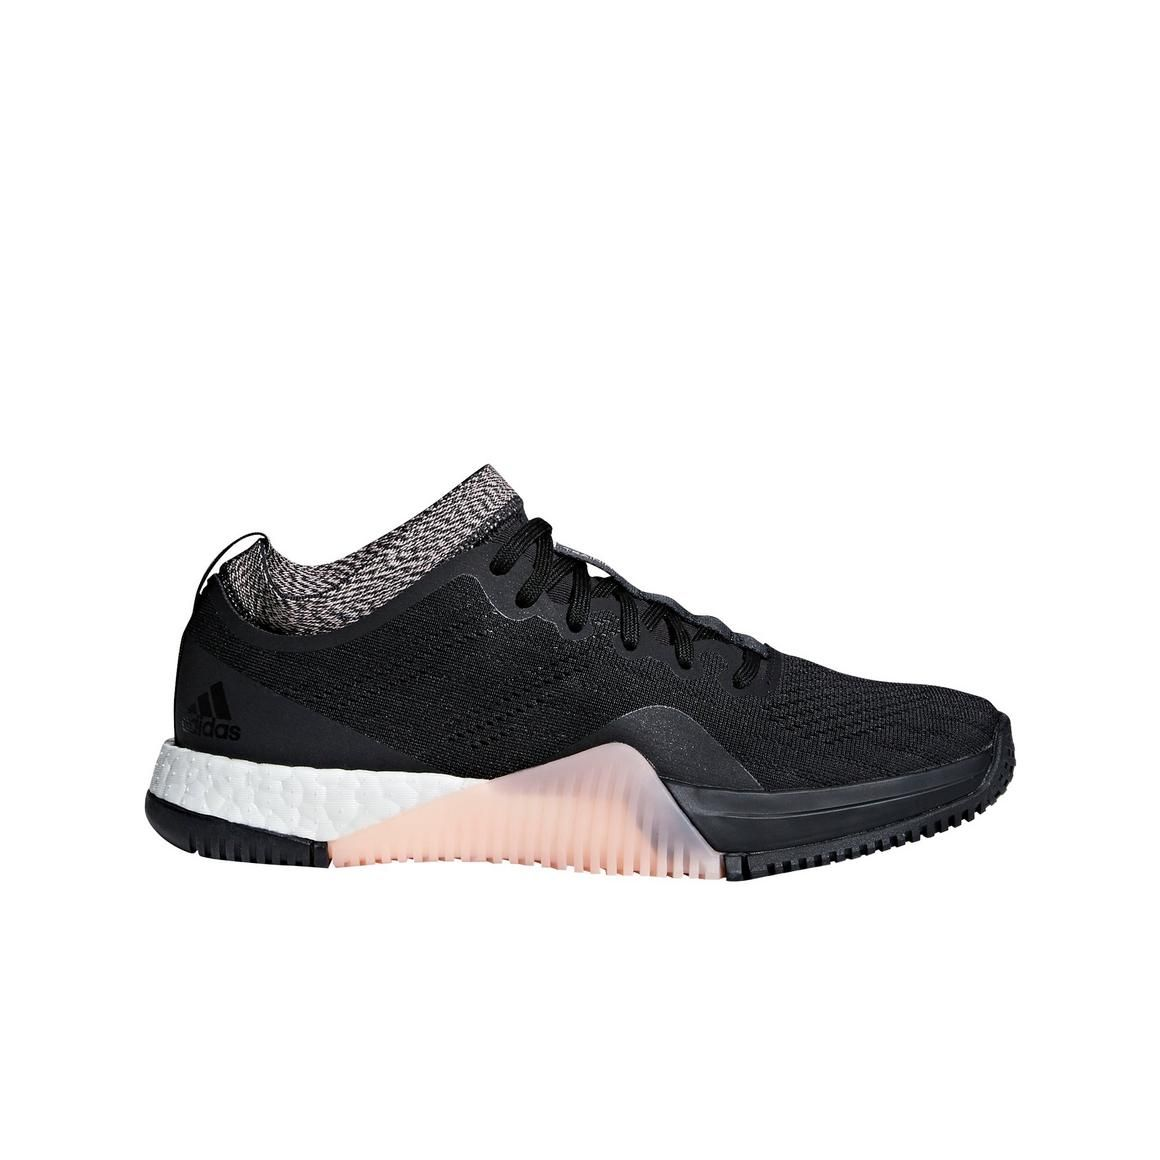 "adidas CrazyTrain Elite ""Black/Grey/Pink"" Women's Shoe"